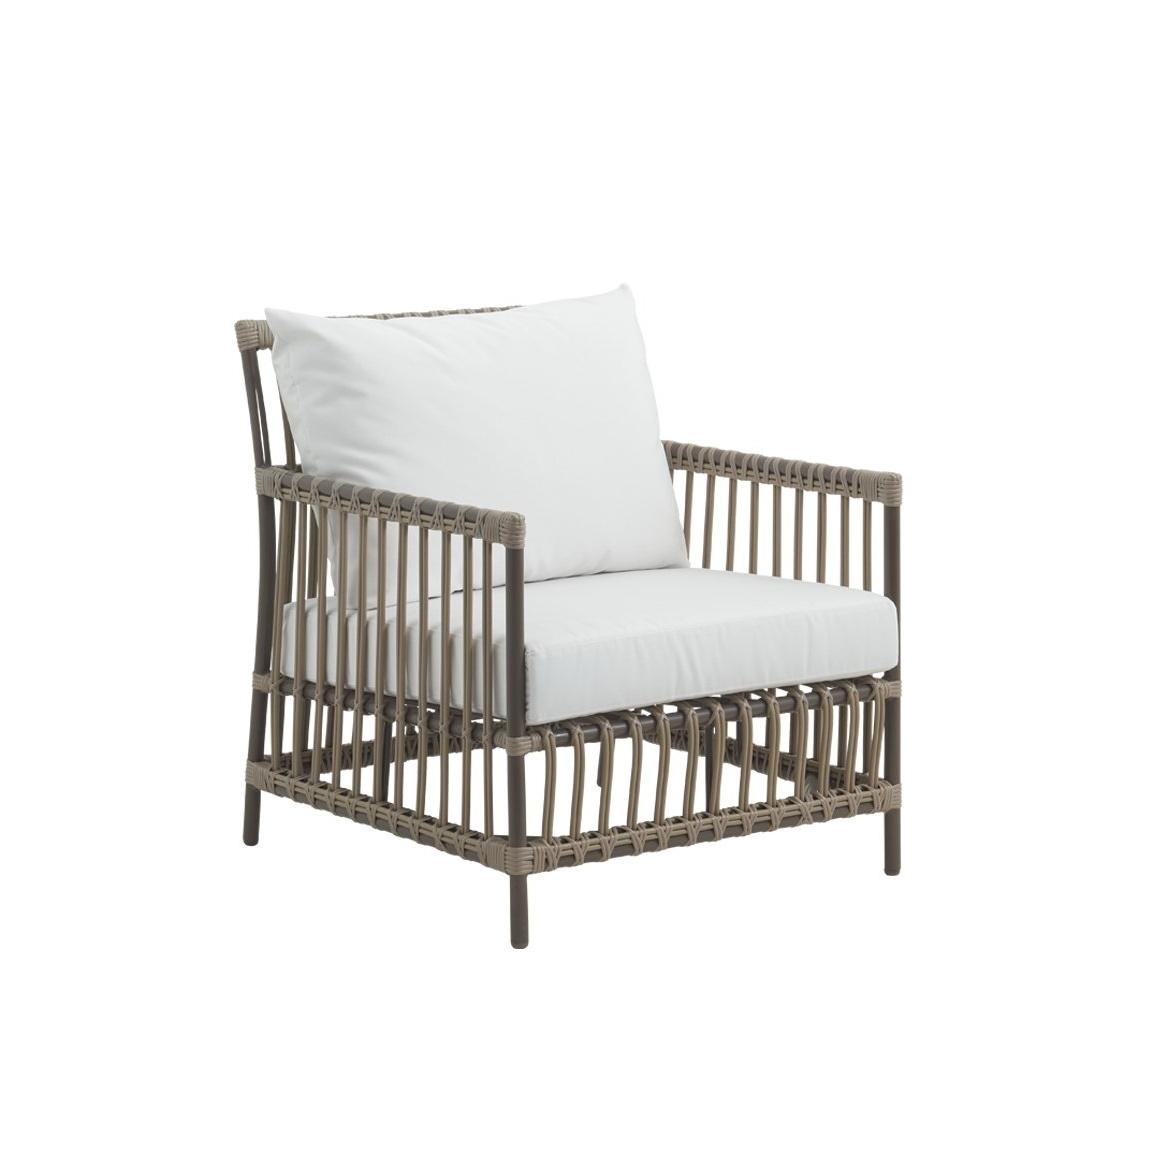 Caroline lounge chair Moccachino Exterior, Sika-Design